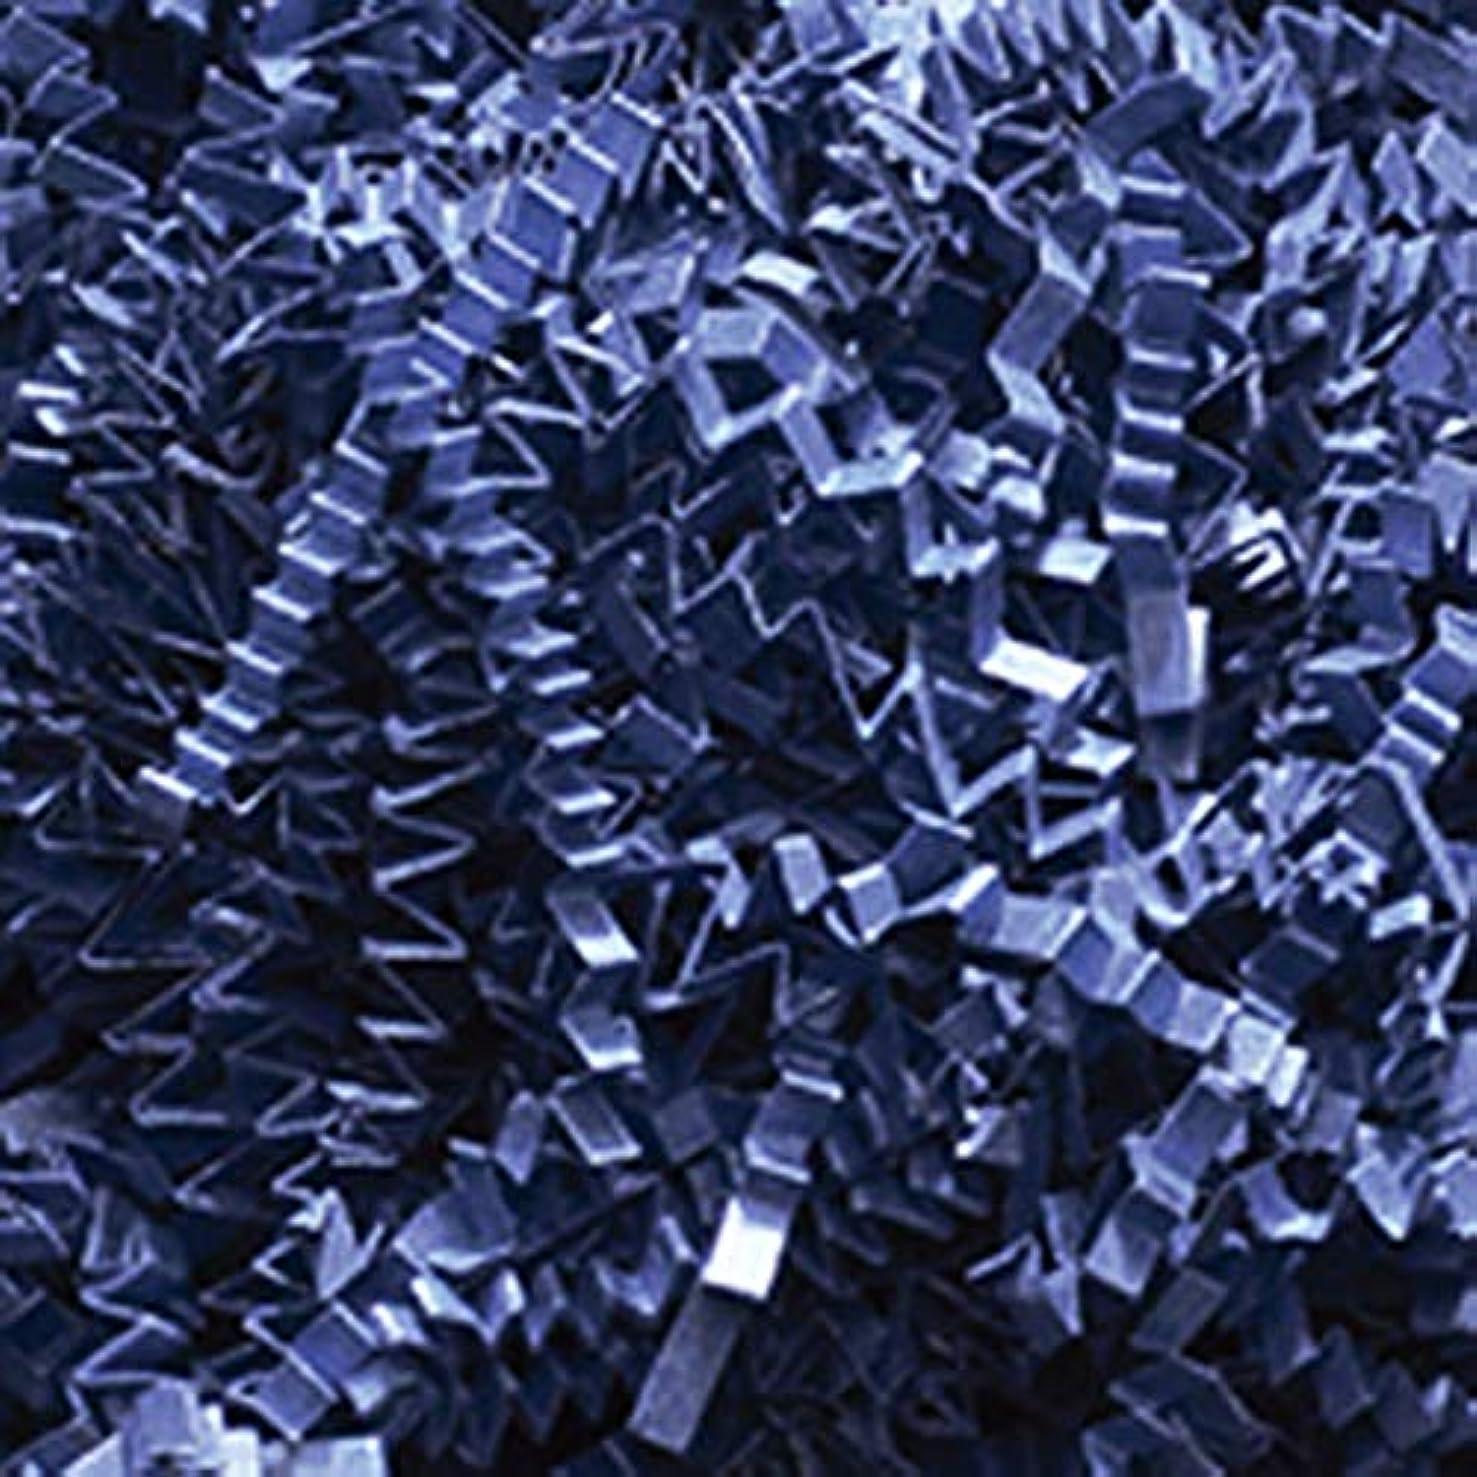 Crinkle Cut Paper Shred Filler (1 LB) for Gift Wrapping & Basket Filling (Navy)